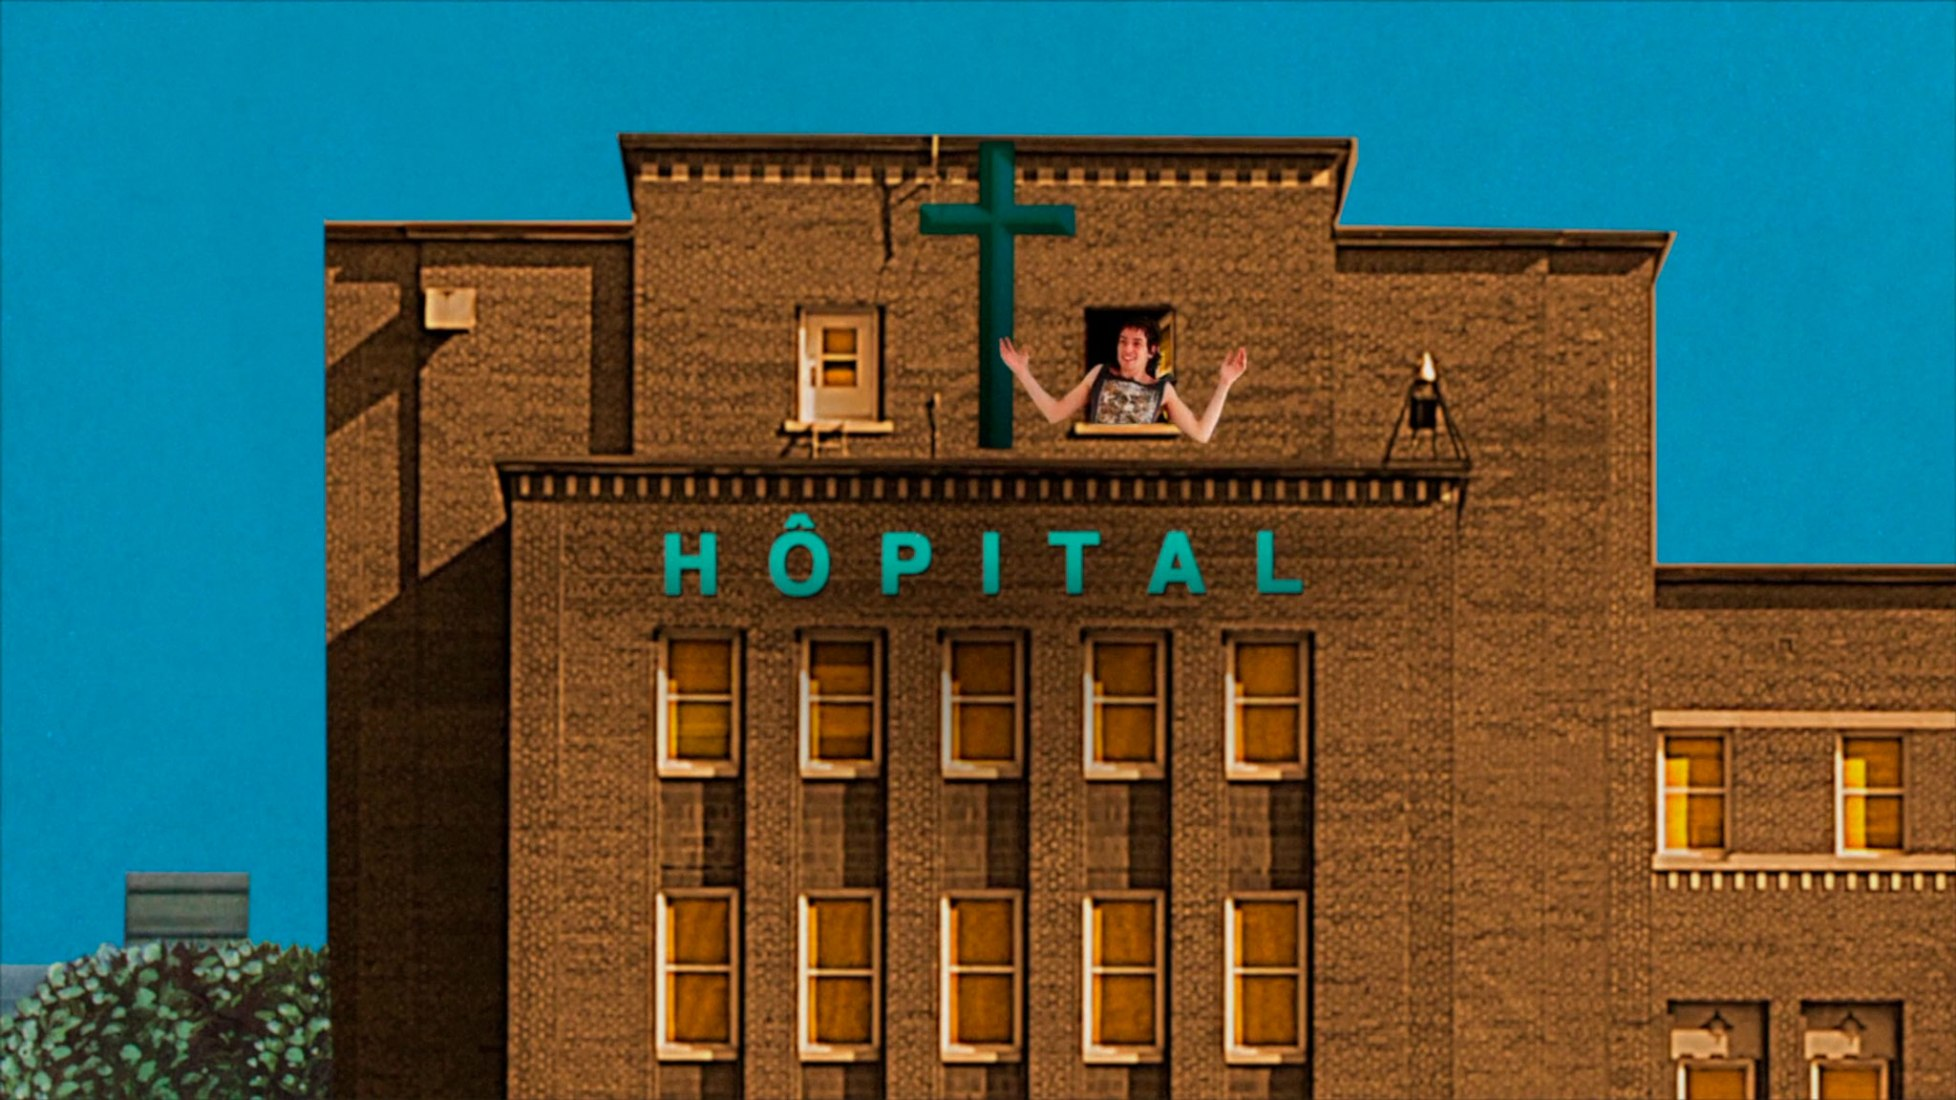 Hôpital by Jesuslesfilles/Jonathan Robert.